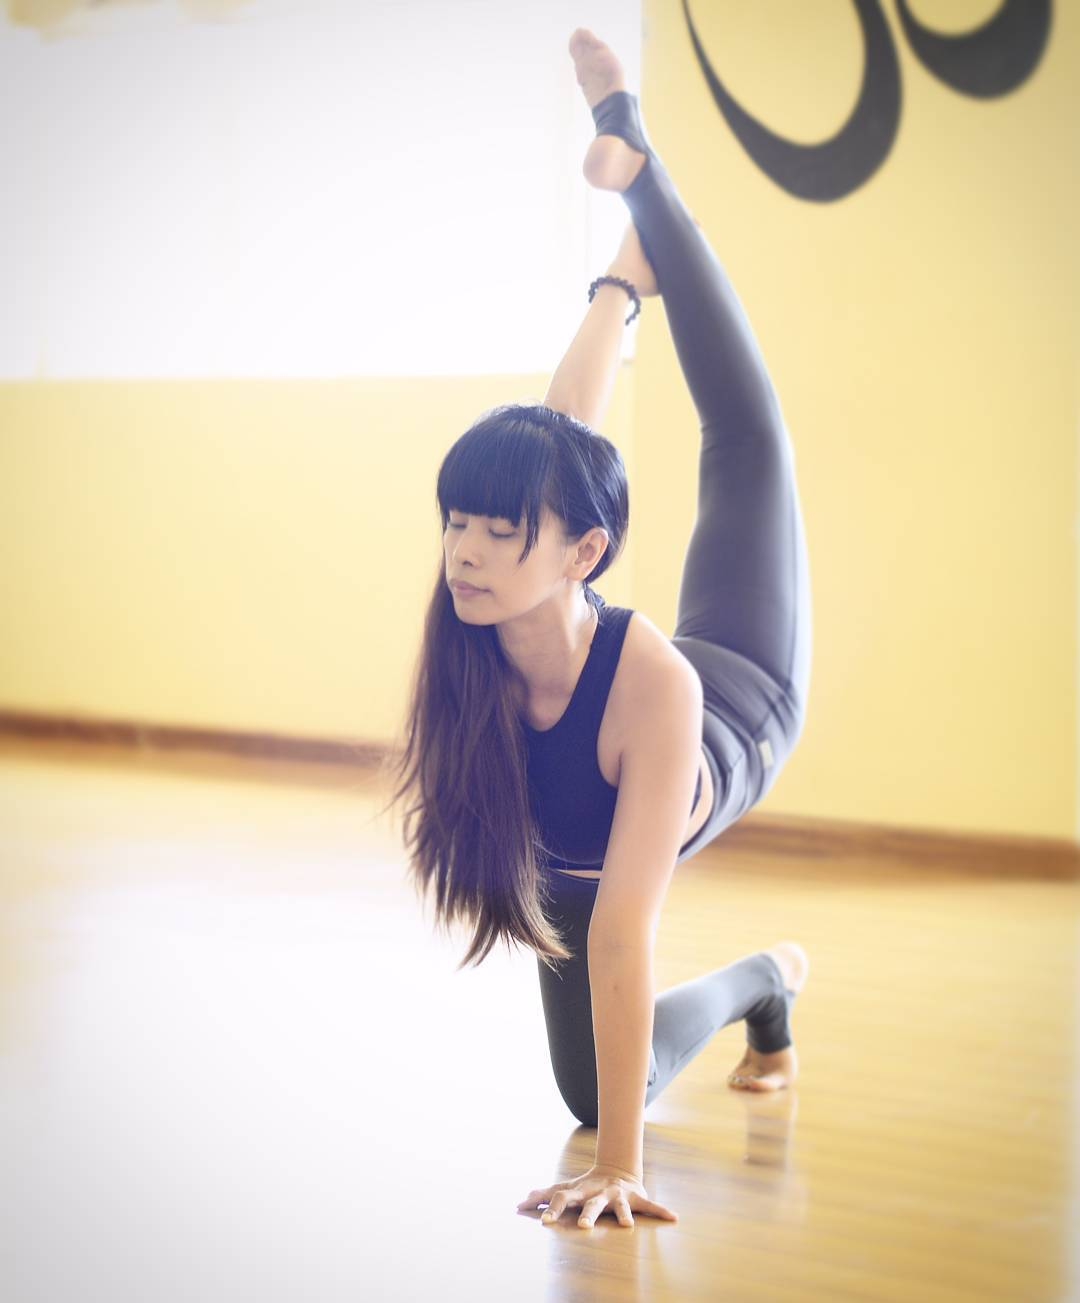 Look1:腿部紧贴有长处 在操练的进程中对付腿部姿势的掌握需要出格留意